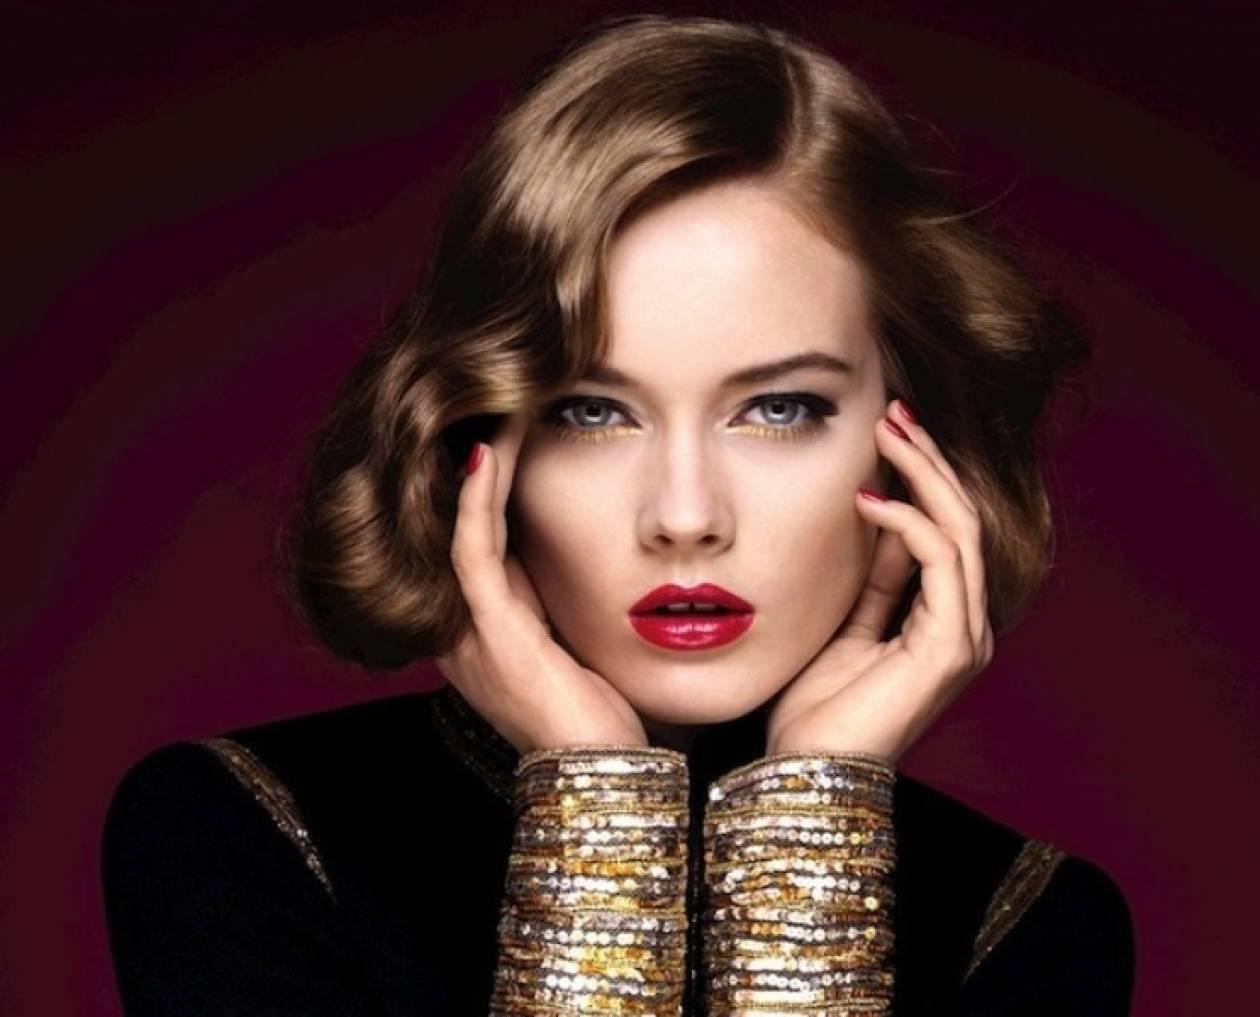 Les Scintillantes: το εορταστικό μακιγιάζ της Chanel